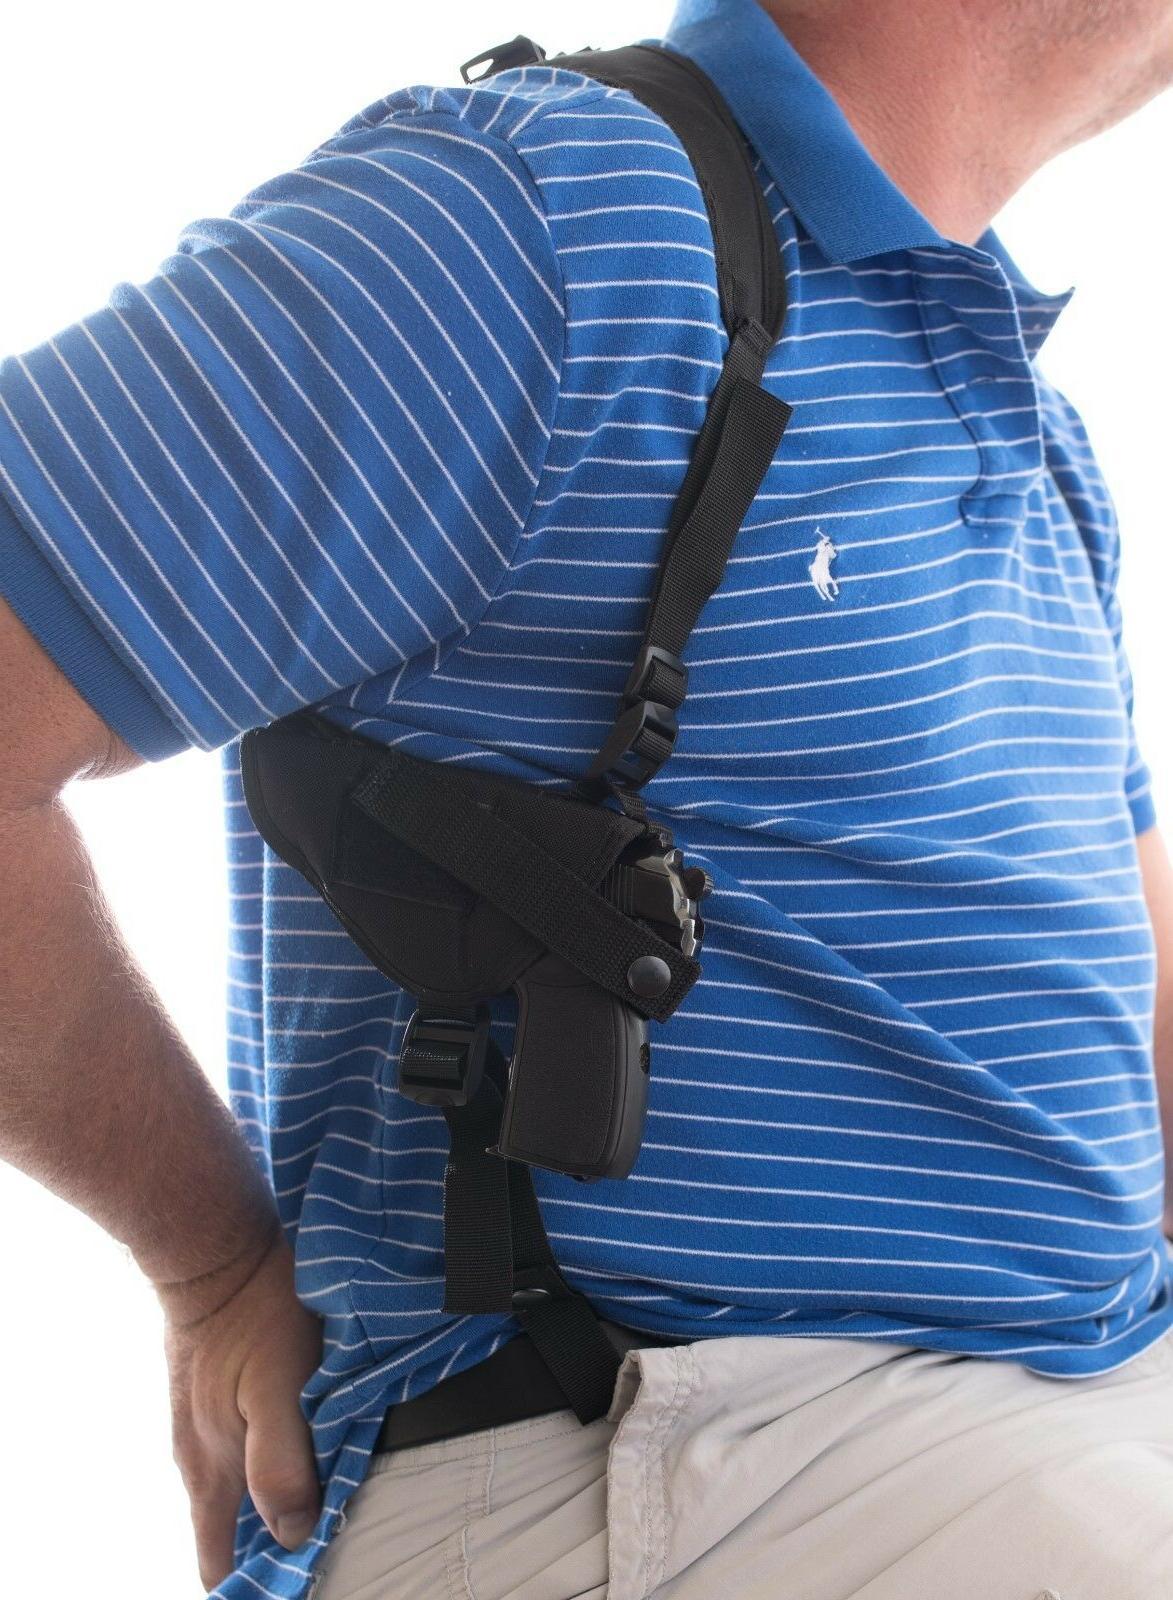 gun holster shoulder fits taurus g3 9mm